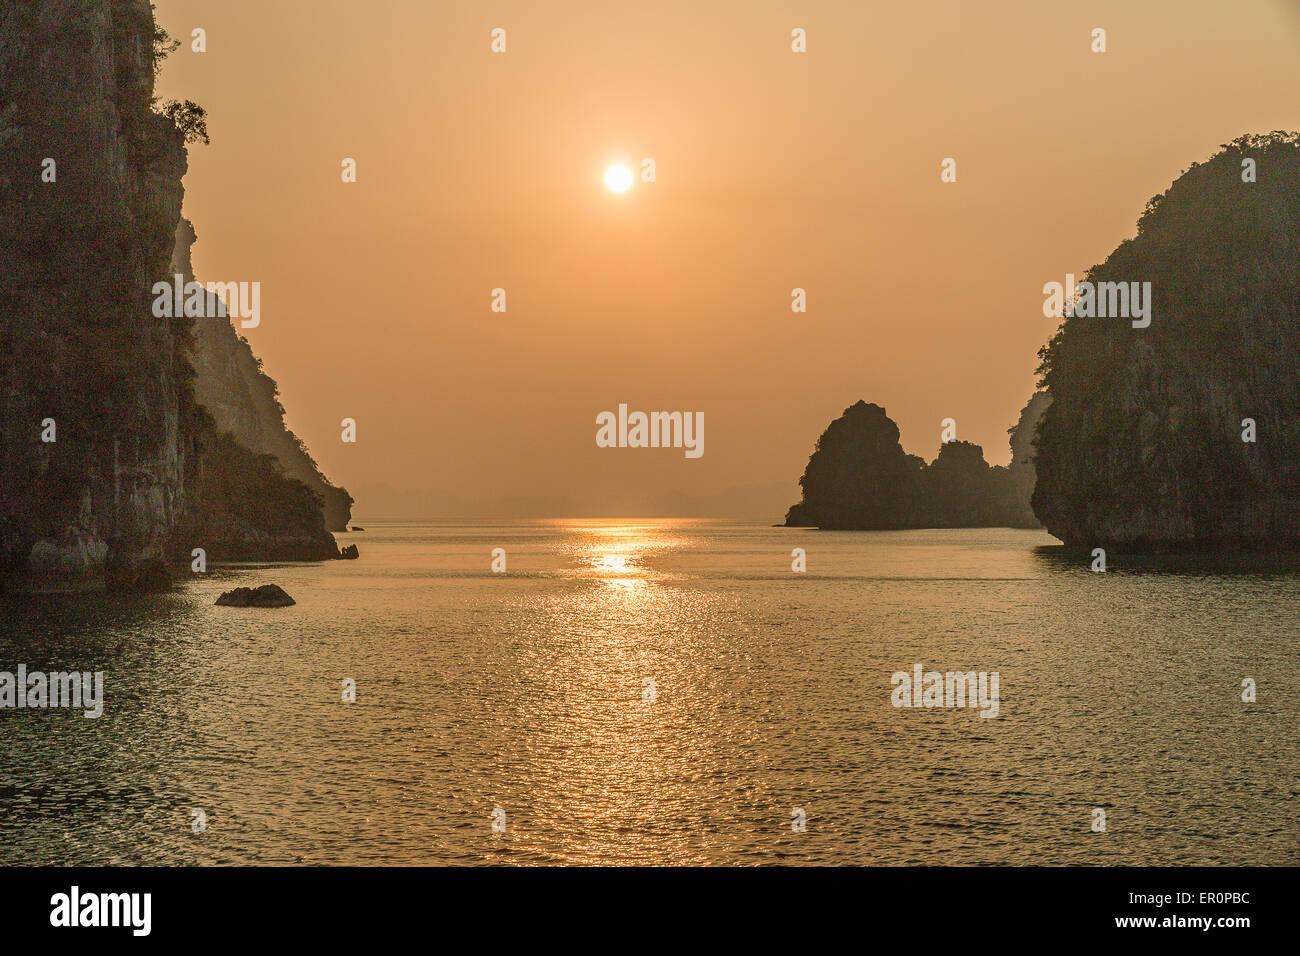 Sunset on Halong bay, Vietnam - Stock Image